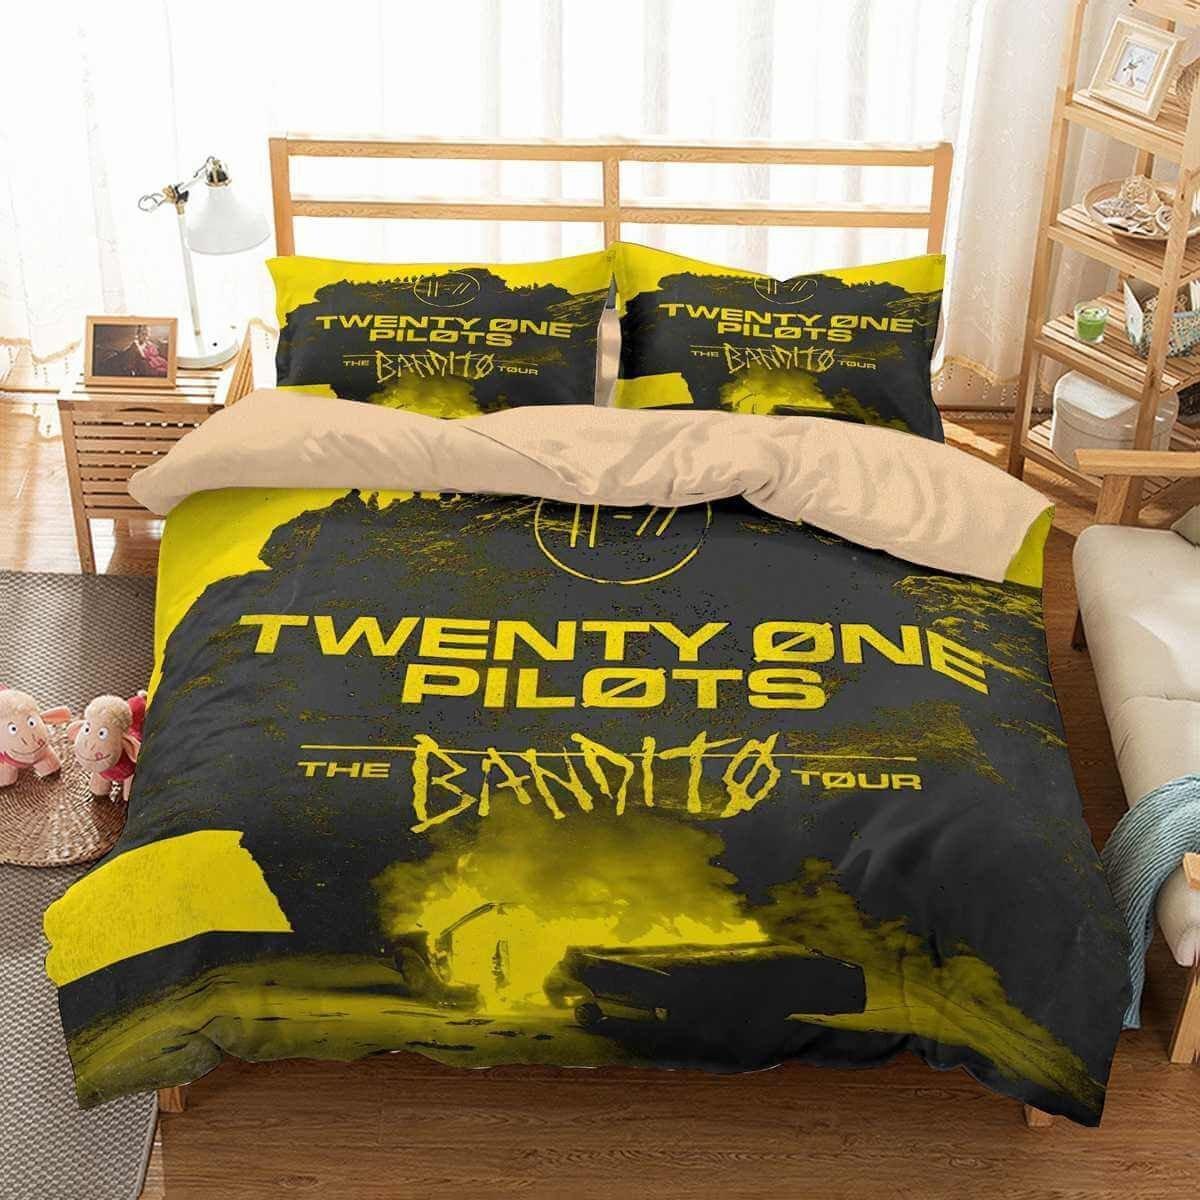 Twenty One Pilots Bedroom Inspirational Best Twenty ¸ne Pil¸ts Images